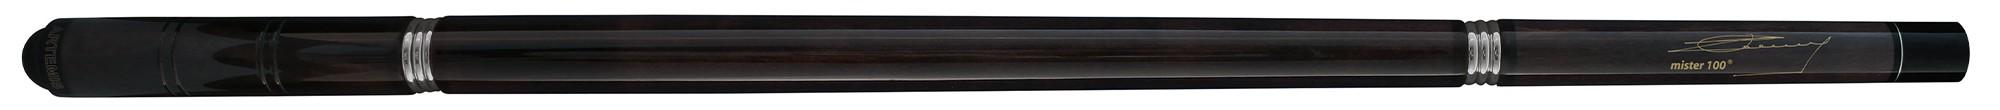 Artemis Mister 100 model 4-delig met ringen 1081104